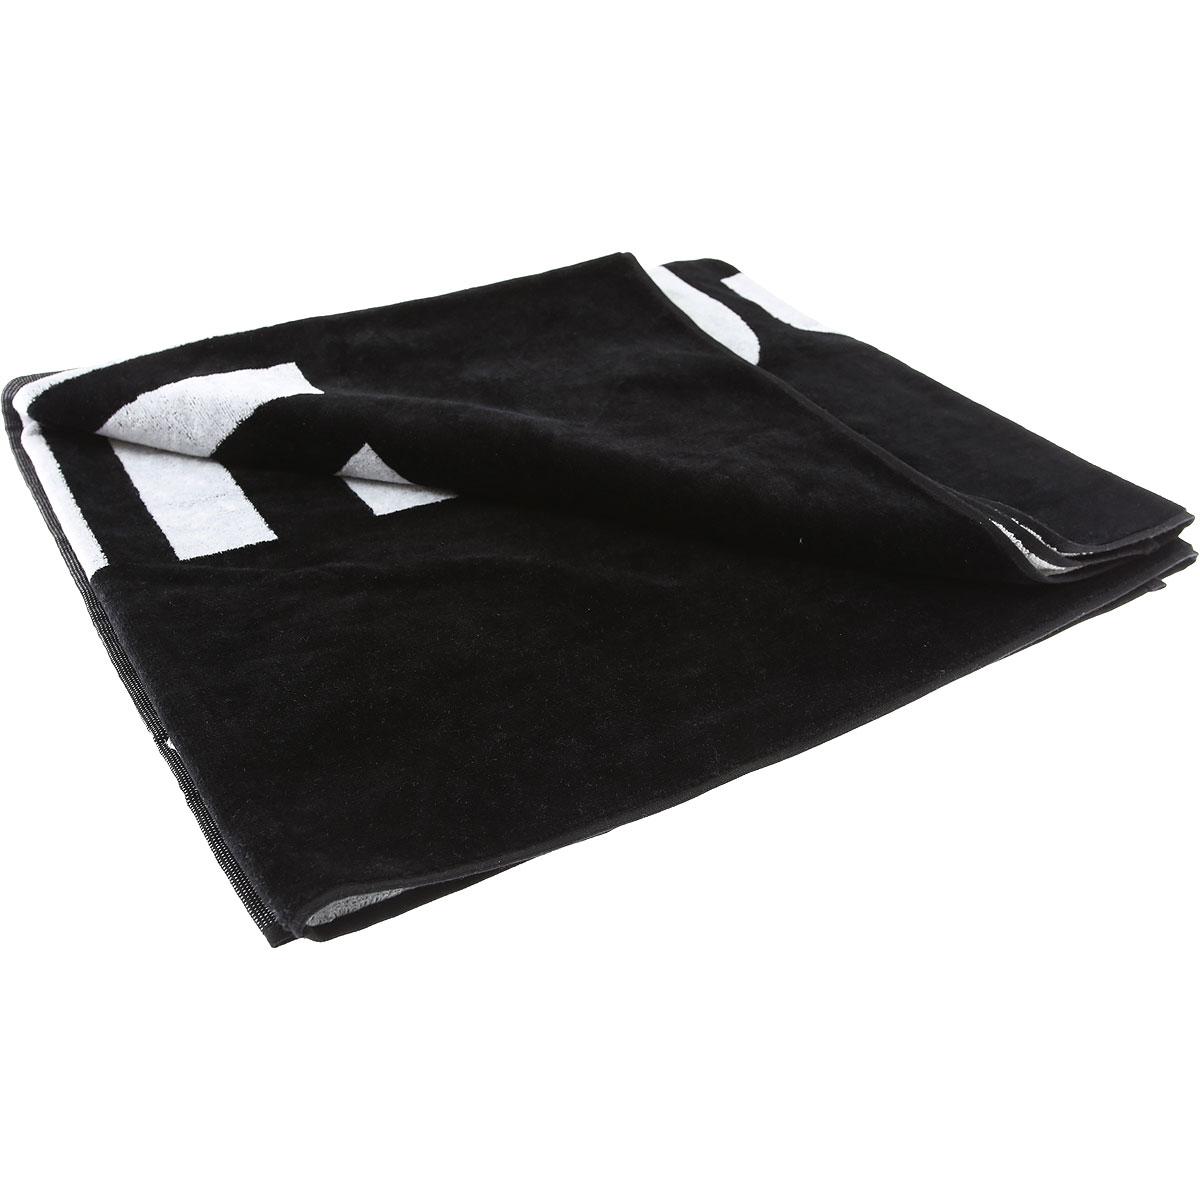 Moschino Beach Towel On Sale, Black, Cotton, 2019